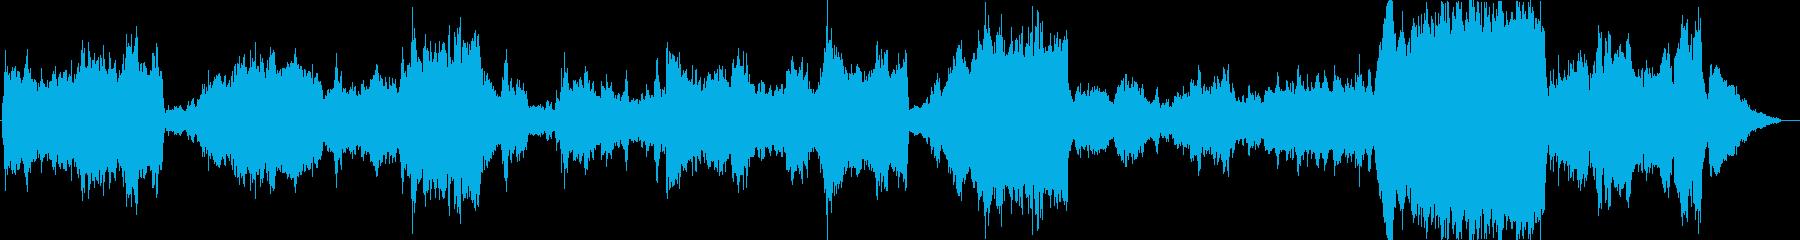 FFタクティクスの世界観でオーケストラ曲の再生済みの波形